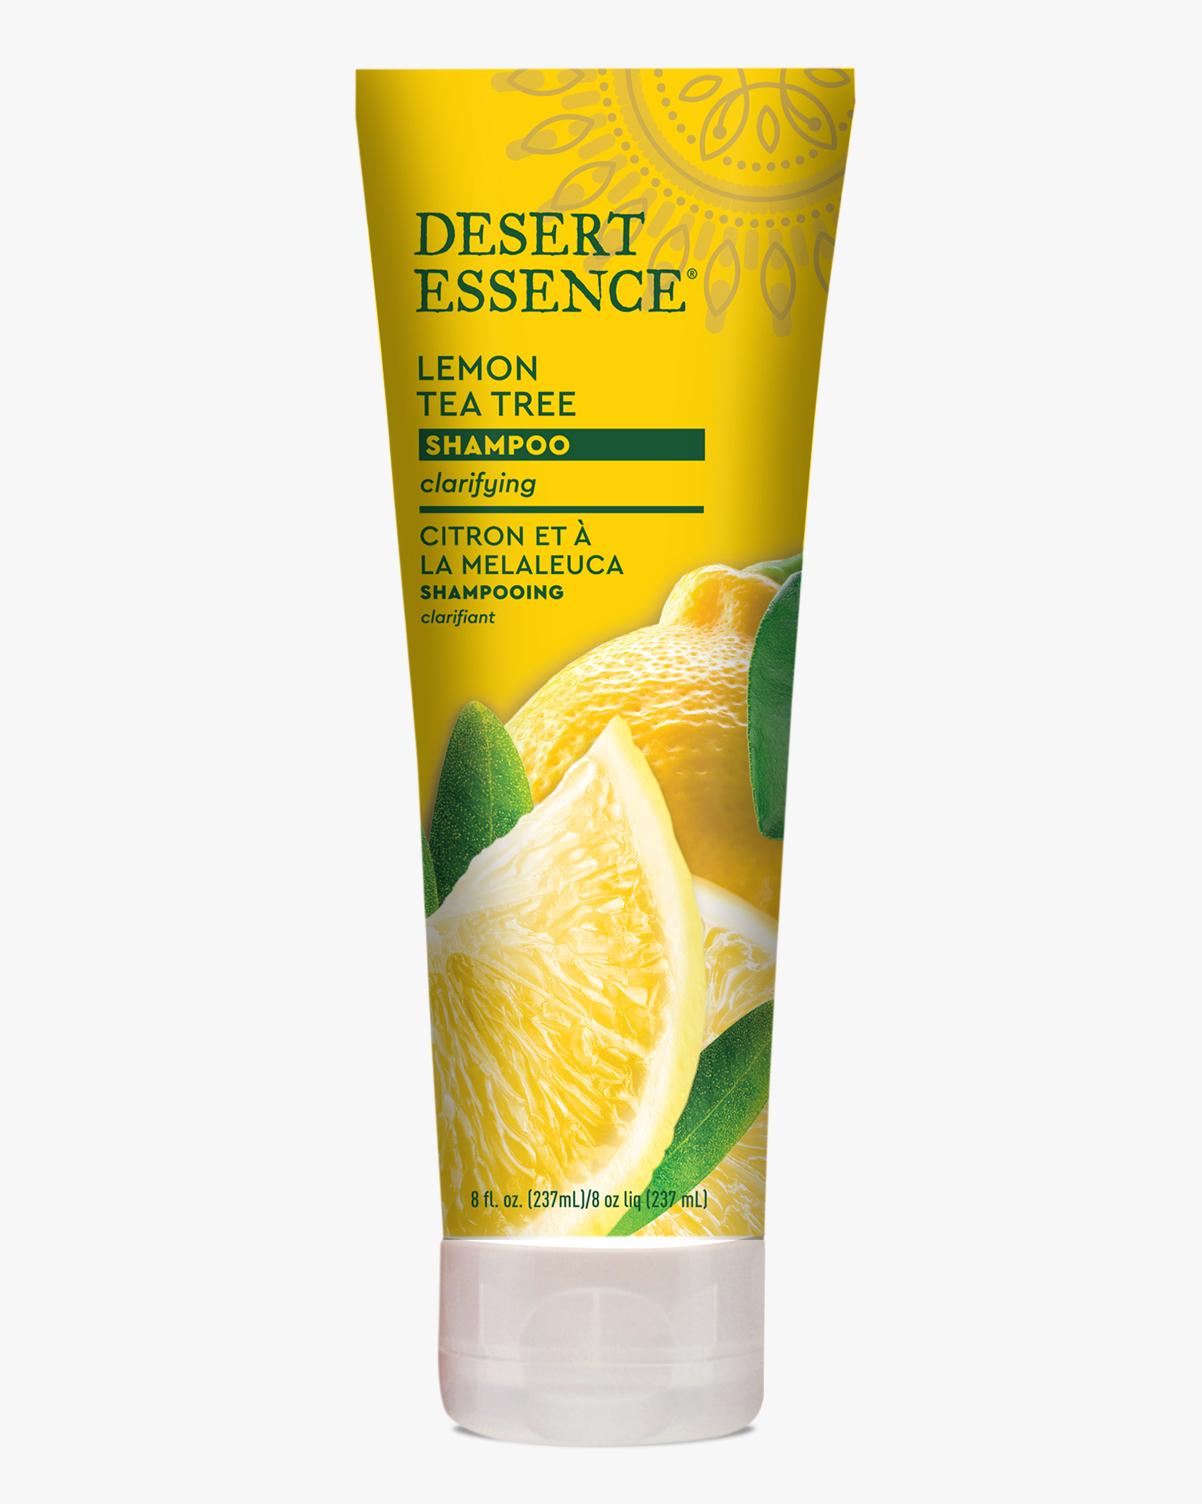 Desert Essence coupon: Desert Essence Lemon Tea Tree Shampoo, 8 fl. oz. | Vegan | Gluten-Free